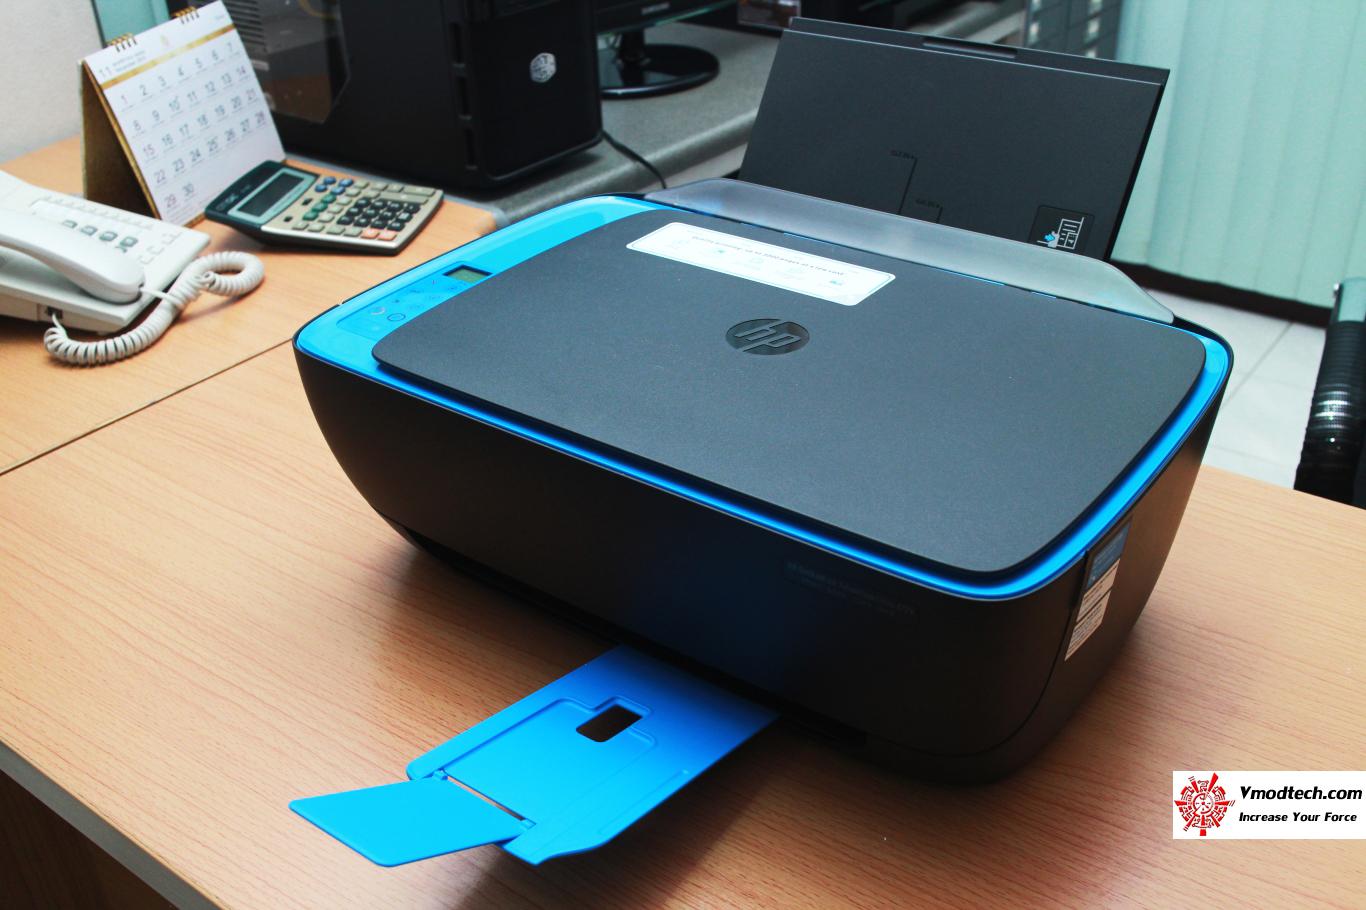 img 6931 HP Deskjet Ink Advantage Ultra 4729 All in One Printer